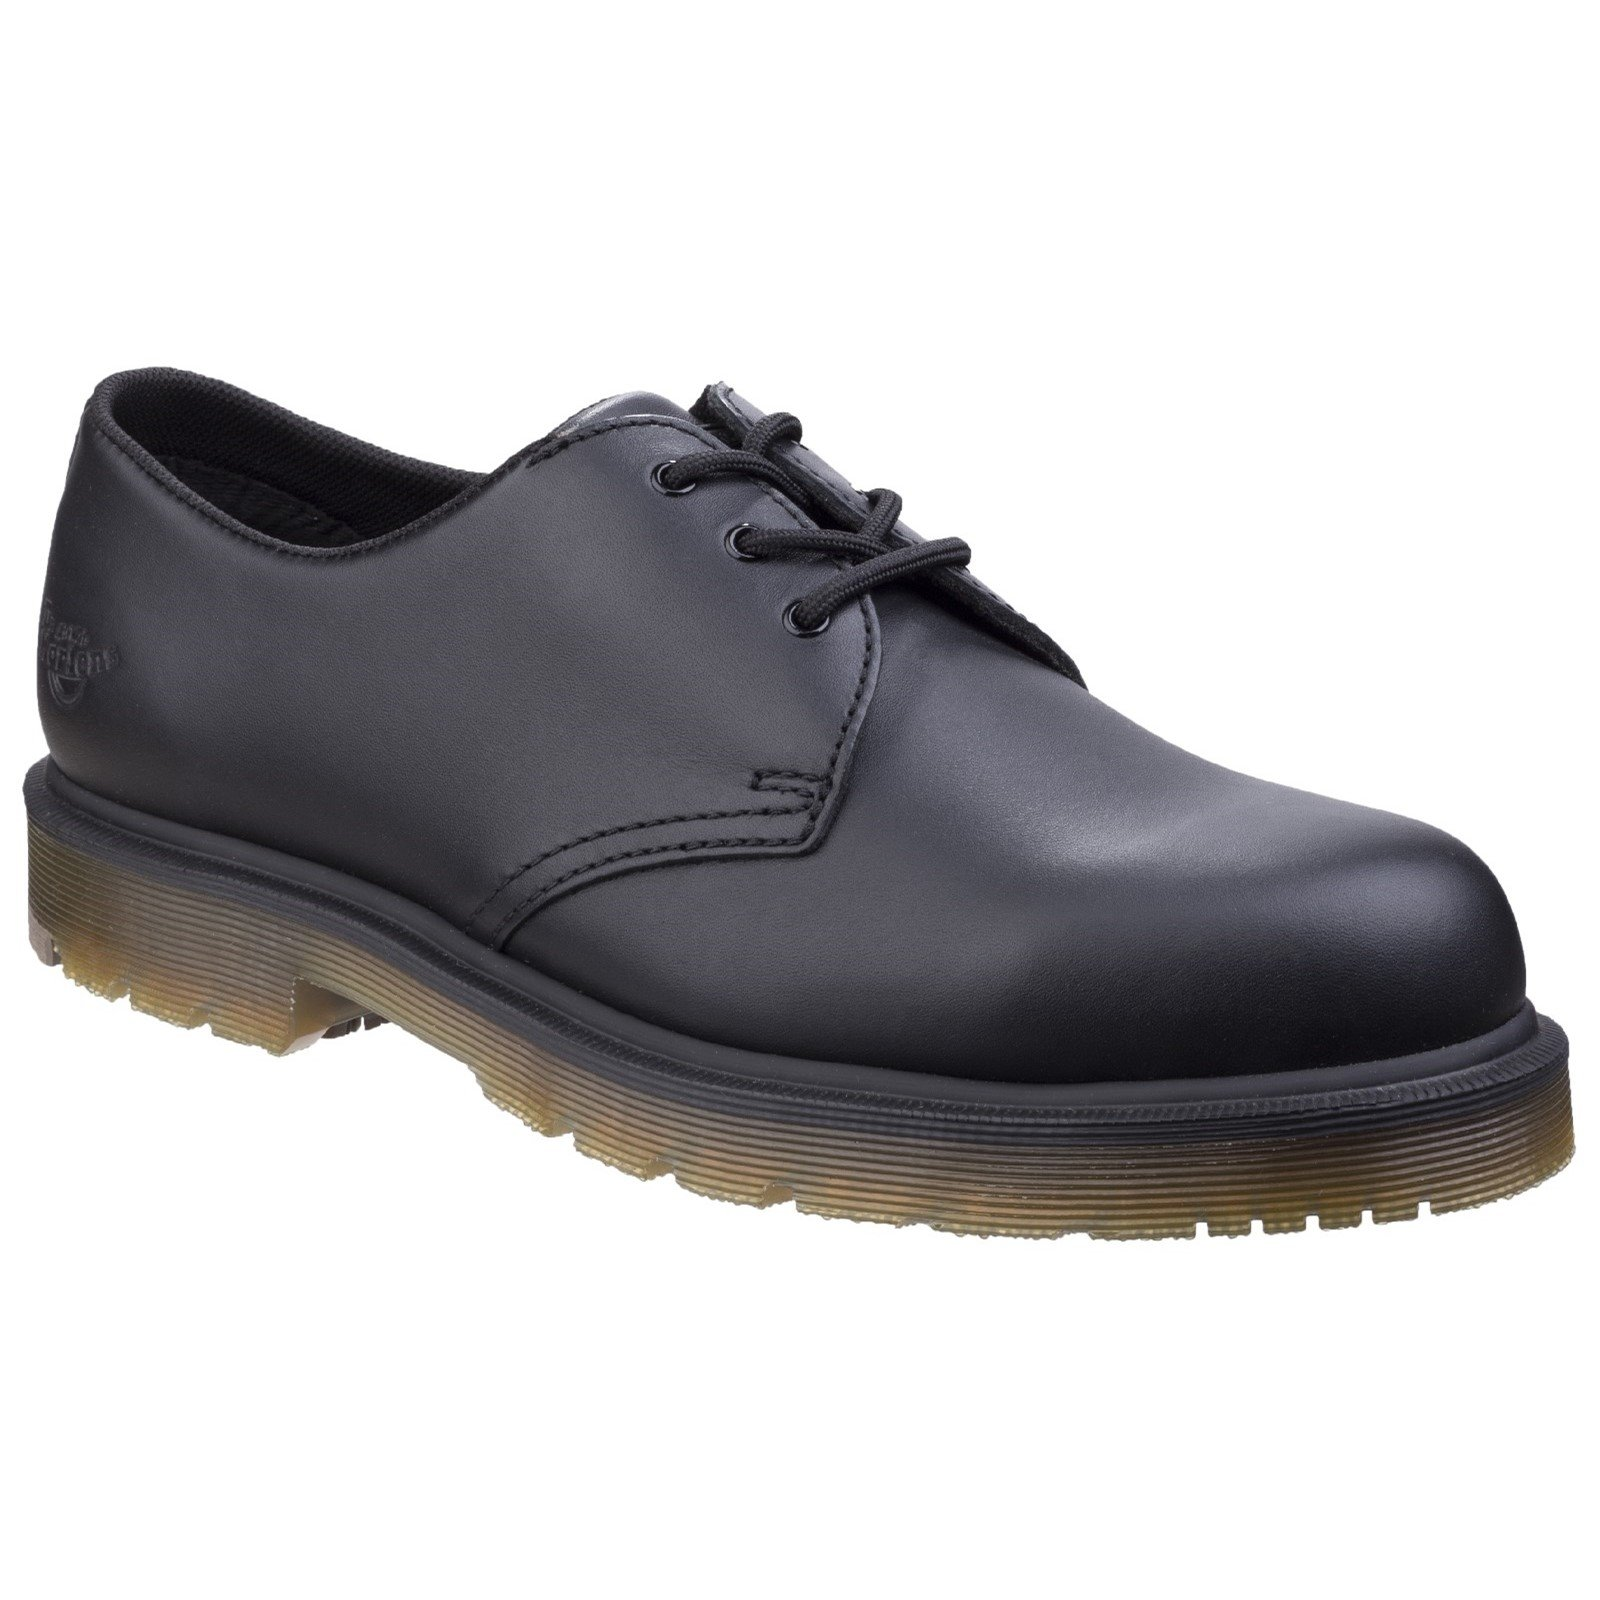 Dr Martens Men's Arlington NS Derby Shoe Black 26781 - Black Industrial Full Grain 3